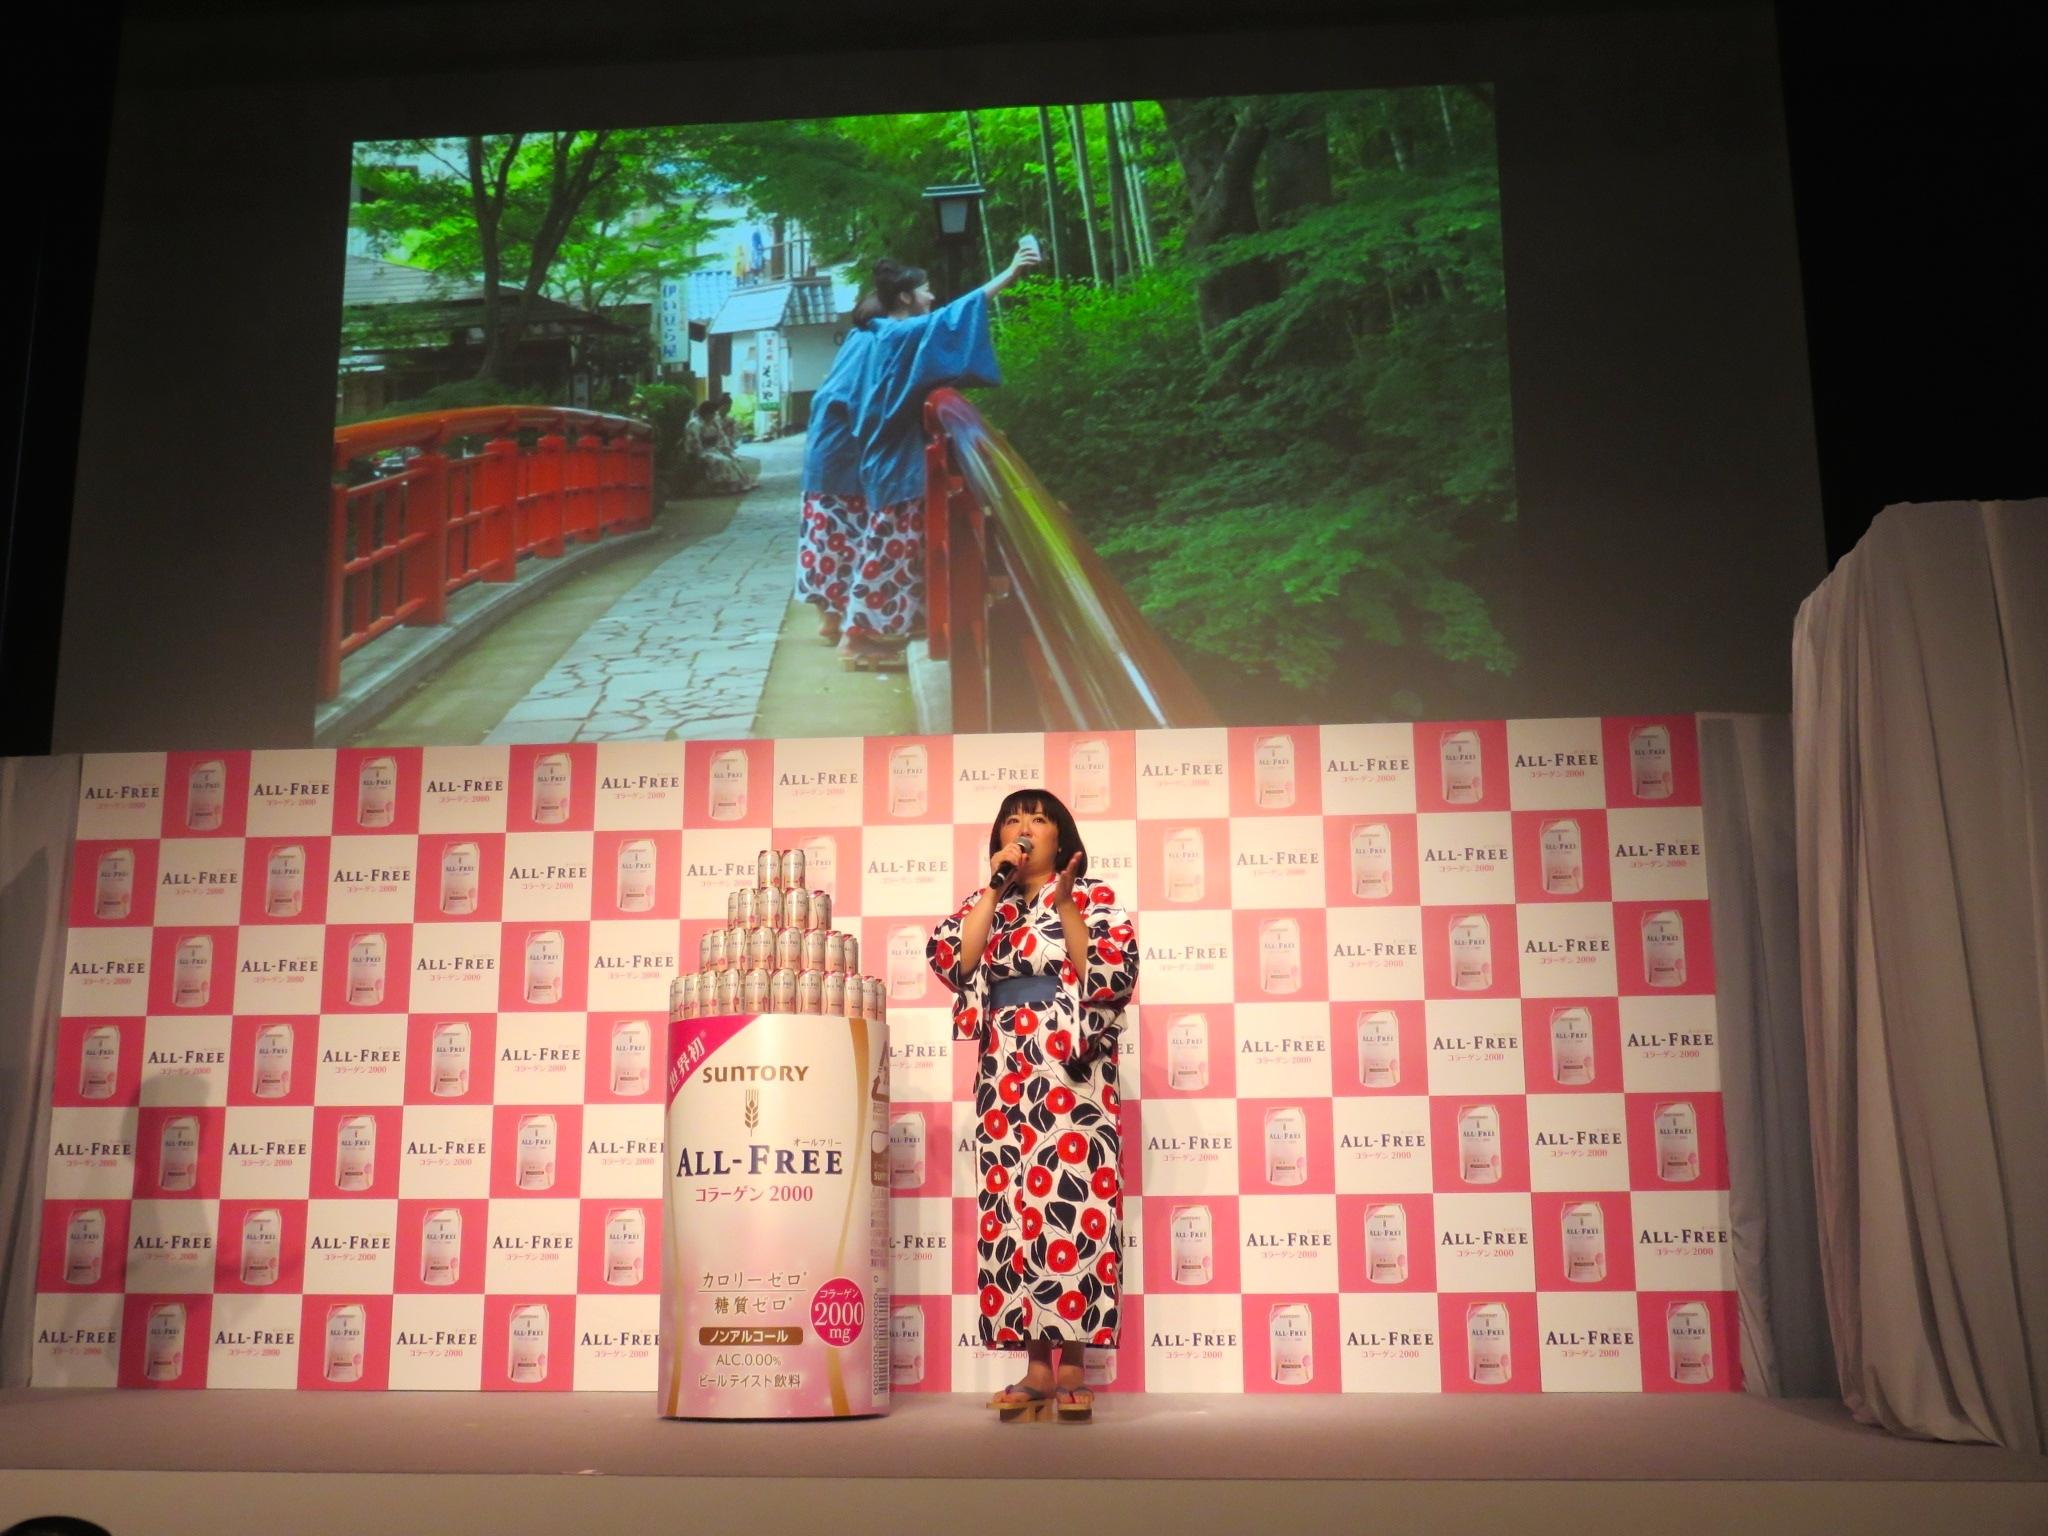 http://news.yoshimoto.co.jp/photos/uncategorized/2015/06/29/20150629193130-9c9bd1d29ebf1017f27ddfb723932e2ca9ad4cb6.jpg